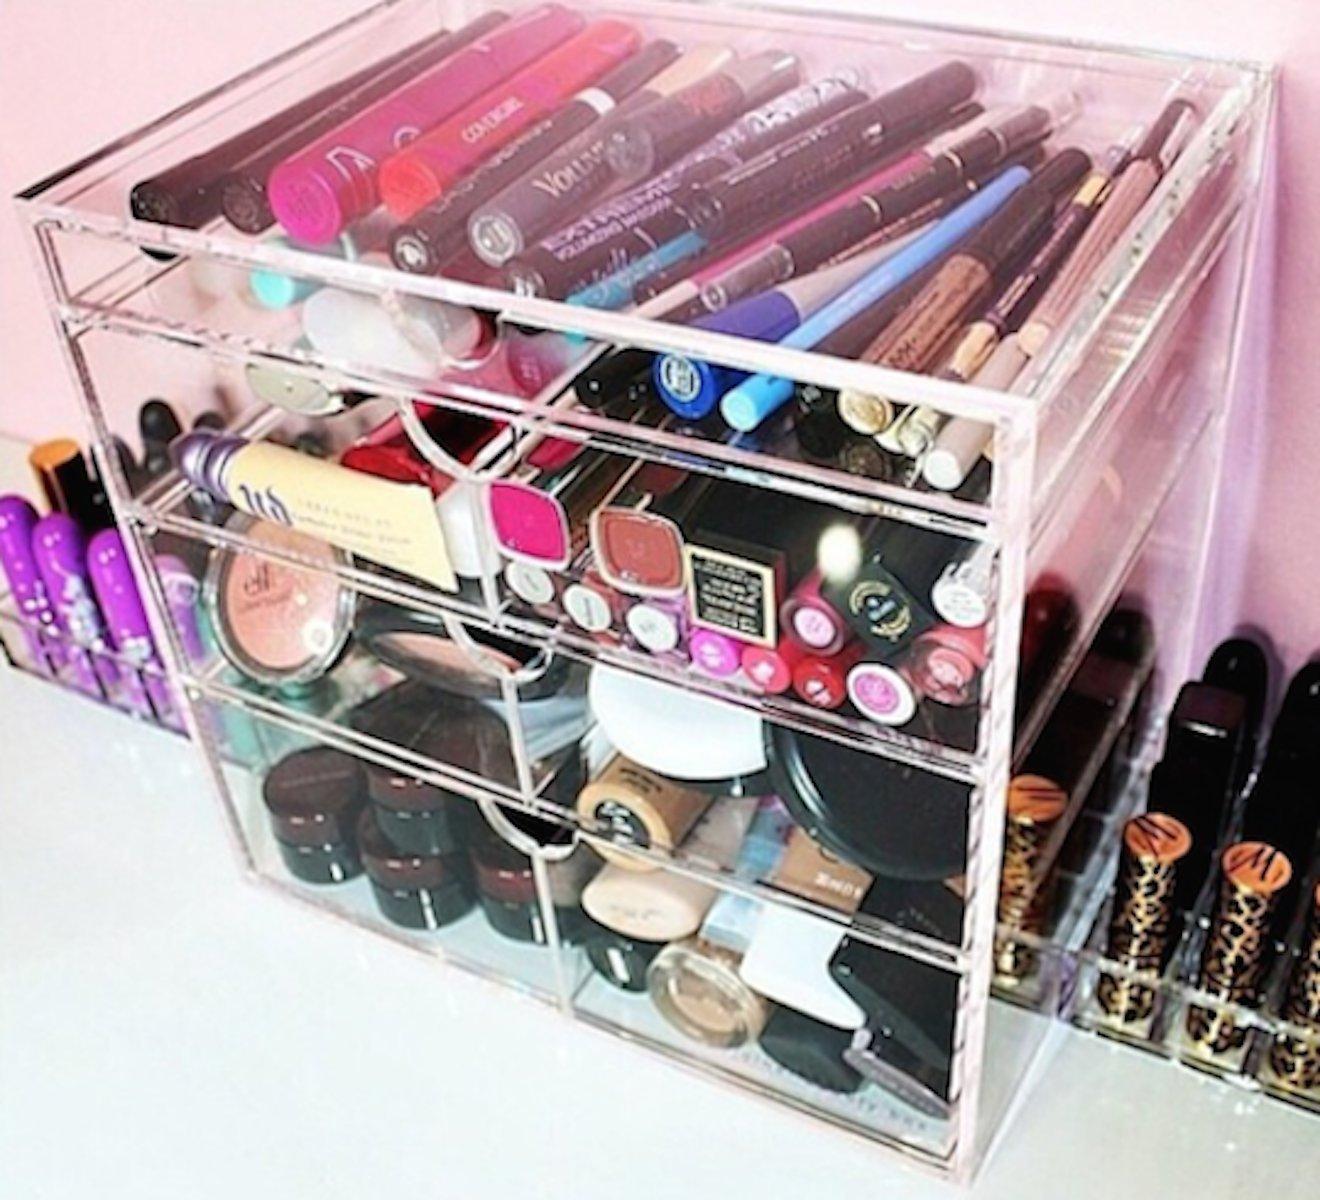 Amazon.com: Original Beauty Box: Beauty